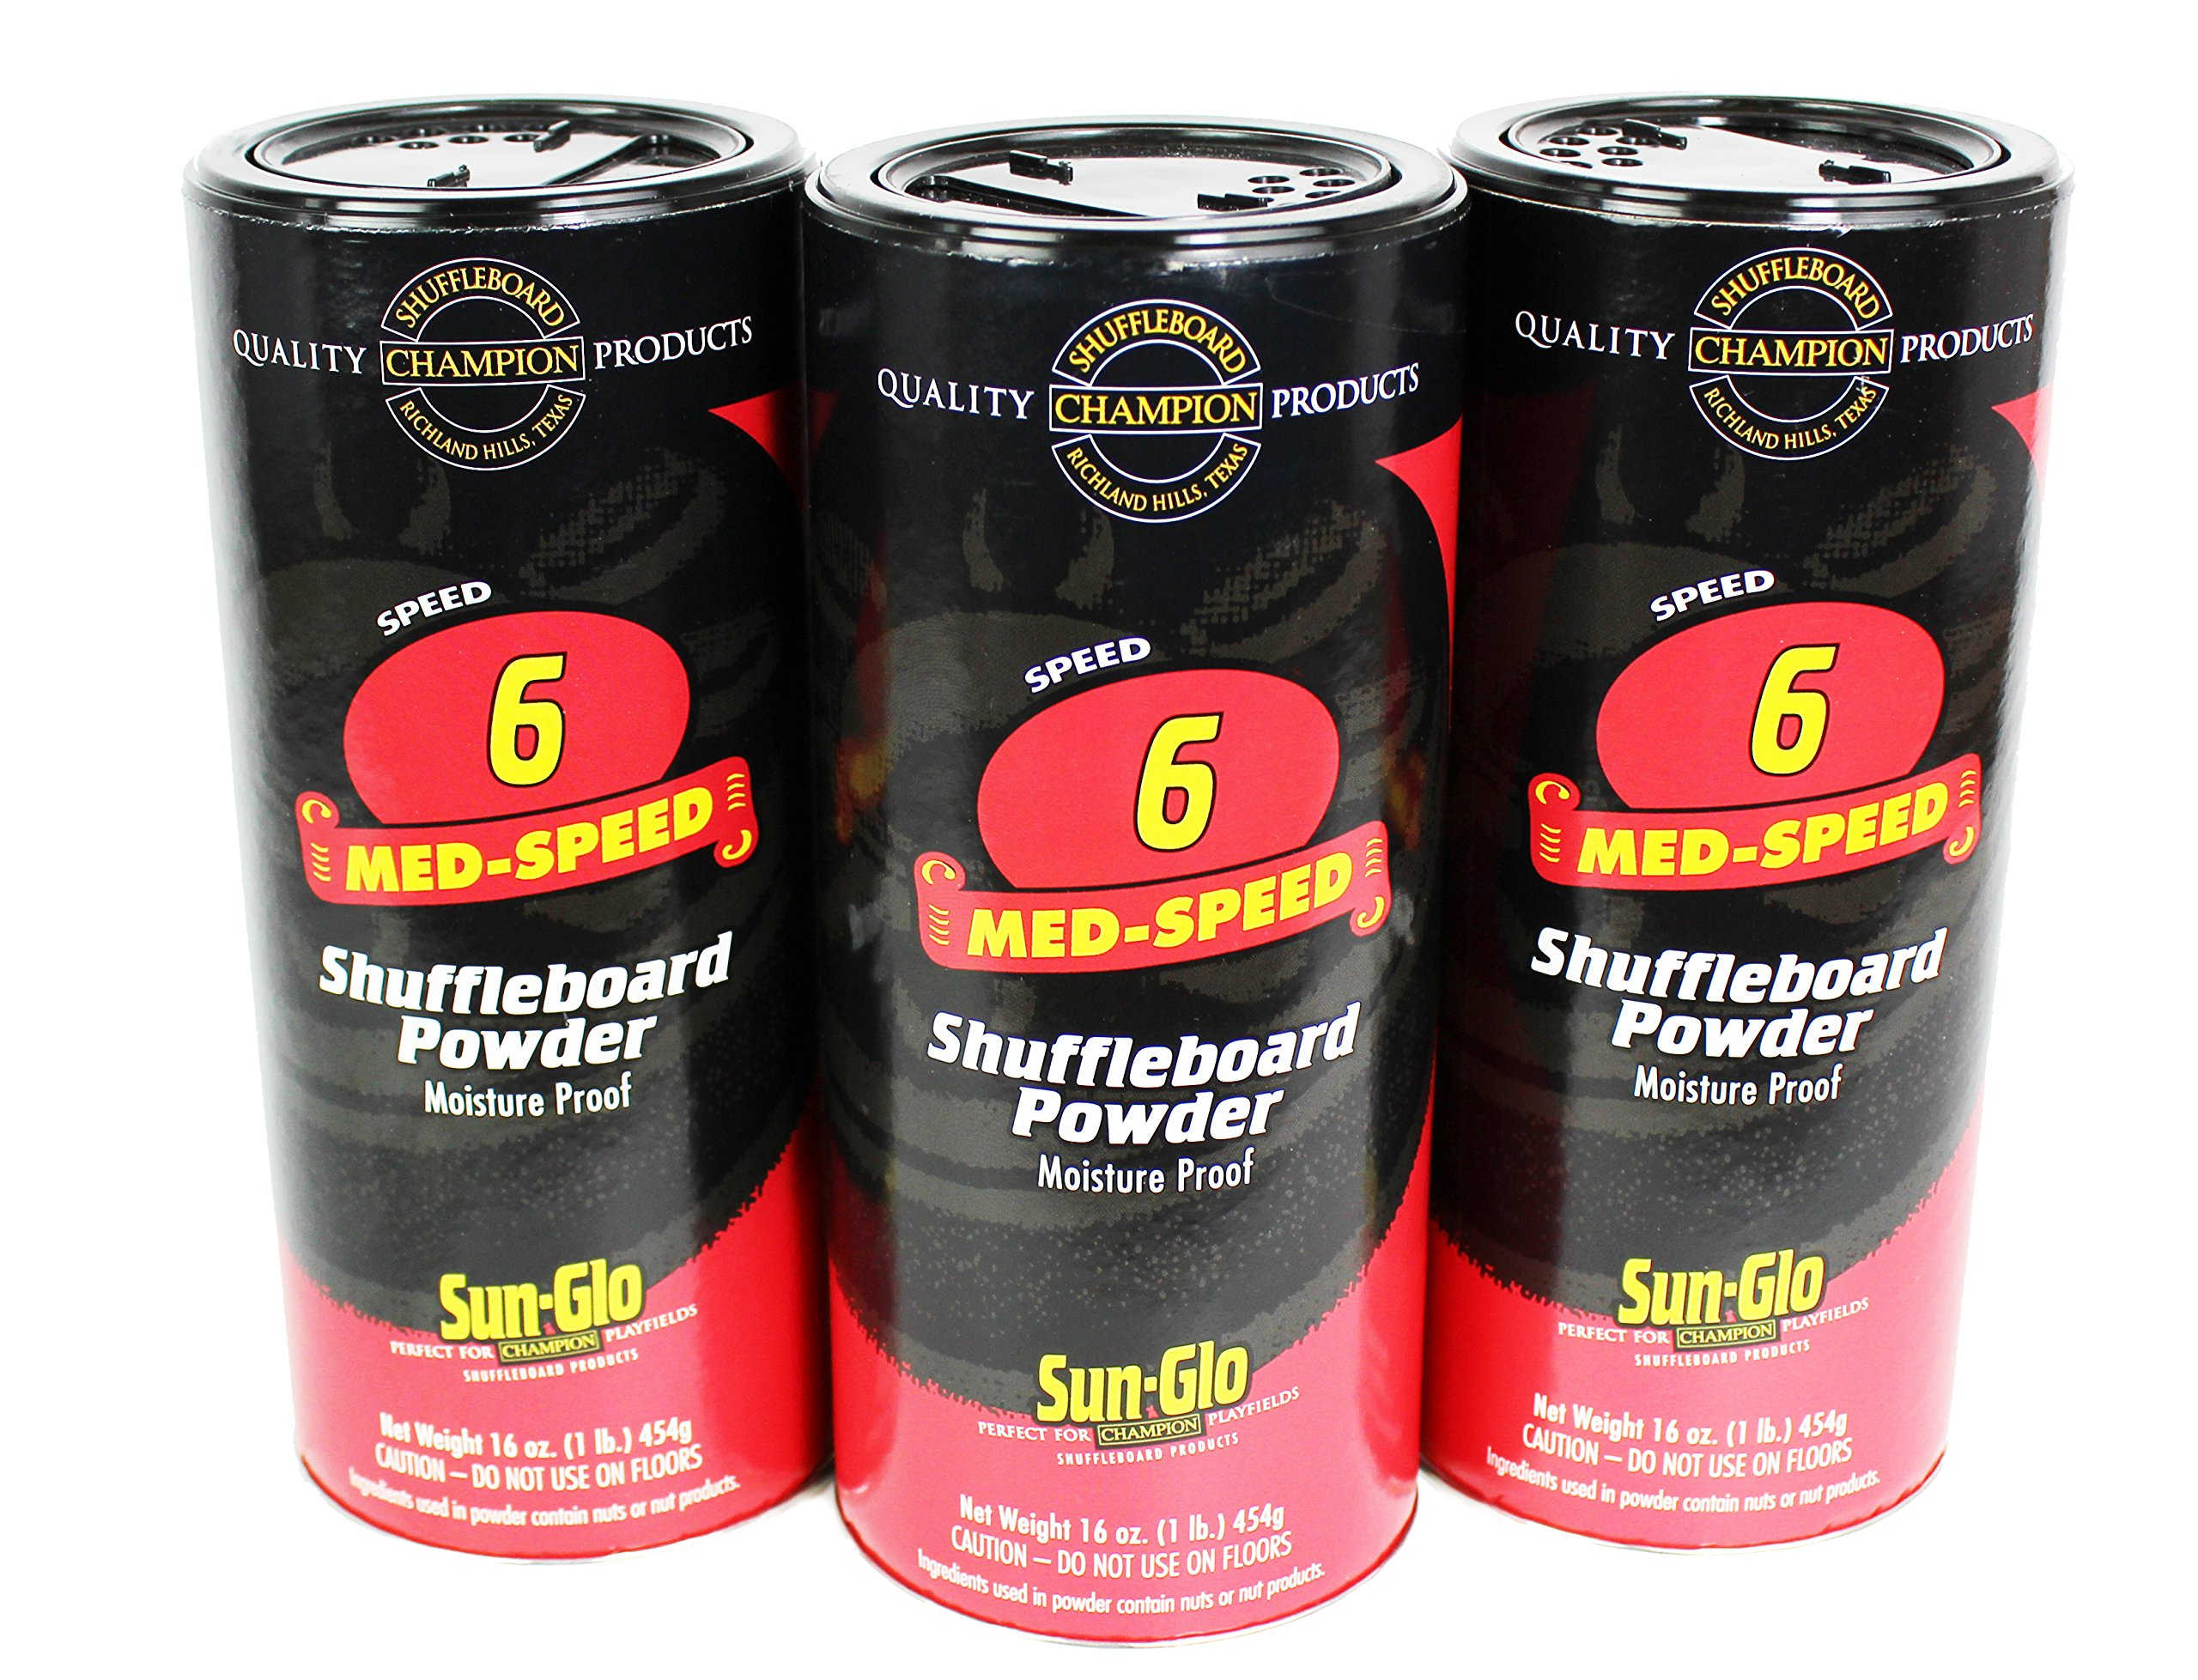 Sun-Glo Shuffleboard Powder Speed #6 - 3 Pack / Cans